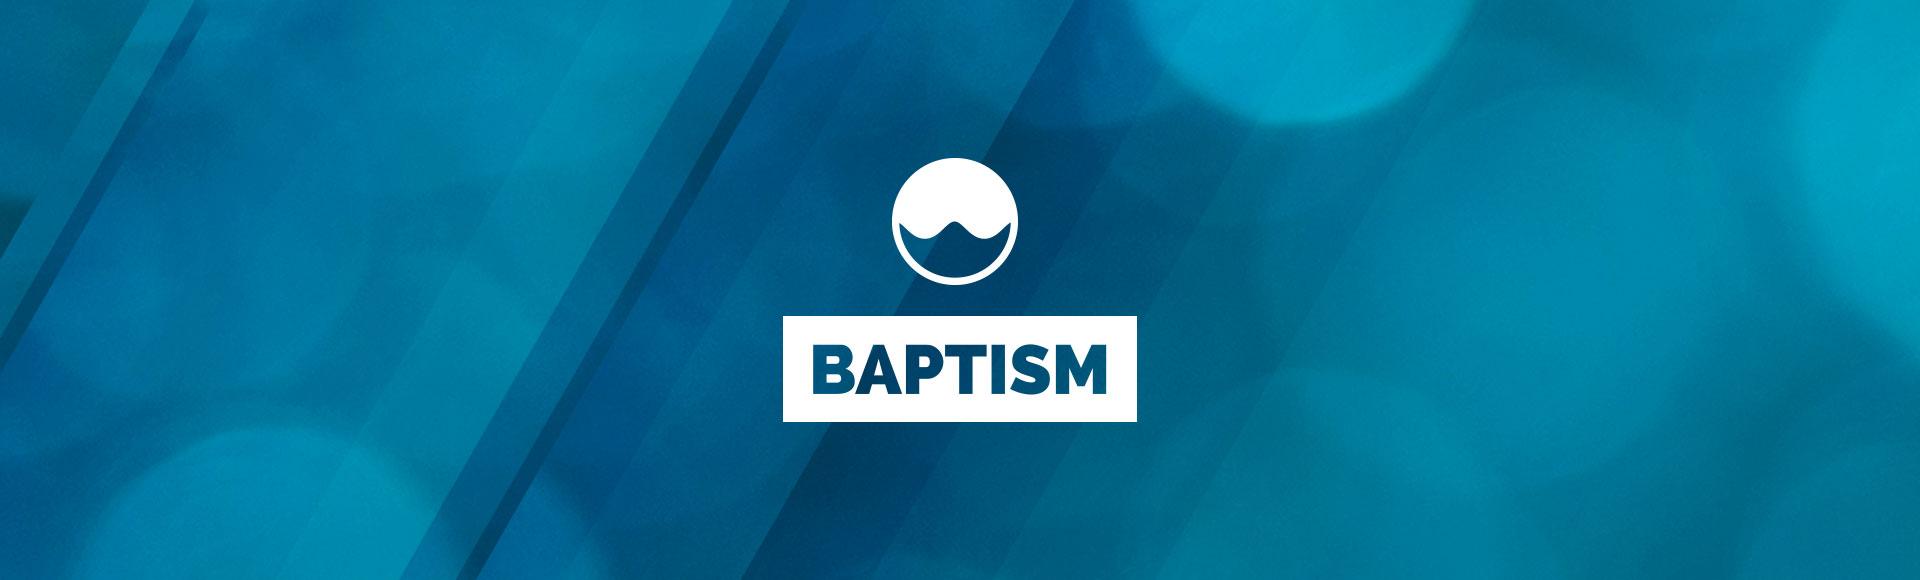 Baptism-1920x580-beta